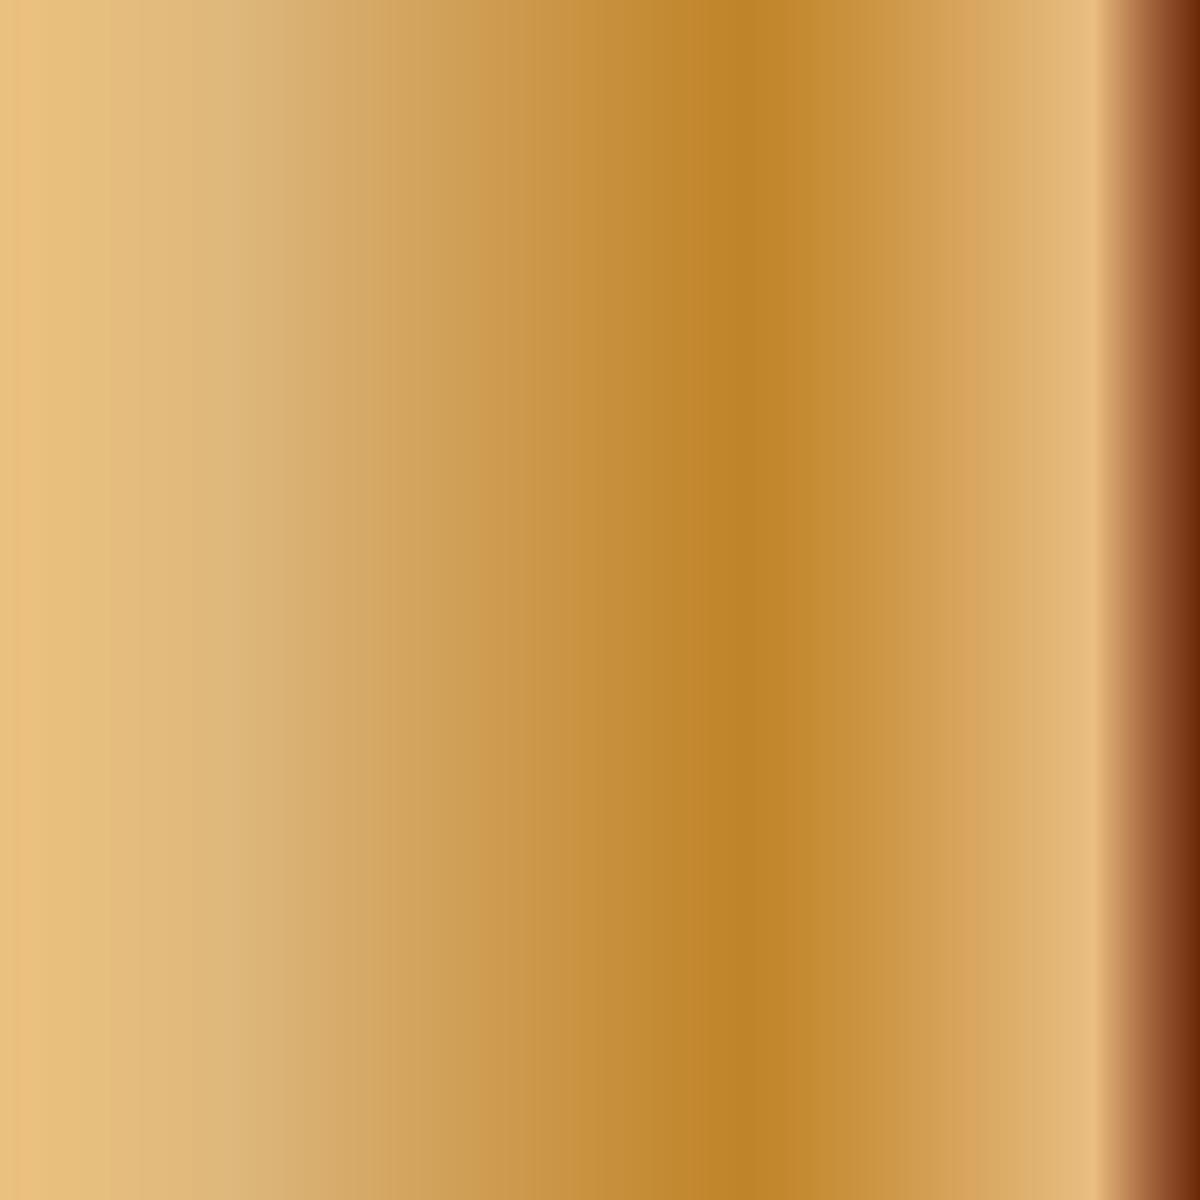 FolkArt ® Brushed Metal™ Acrylic Paint - Antique Gold, 2 oz.